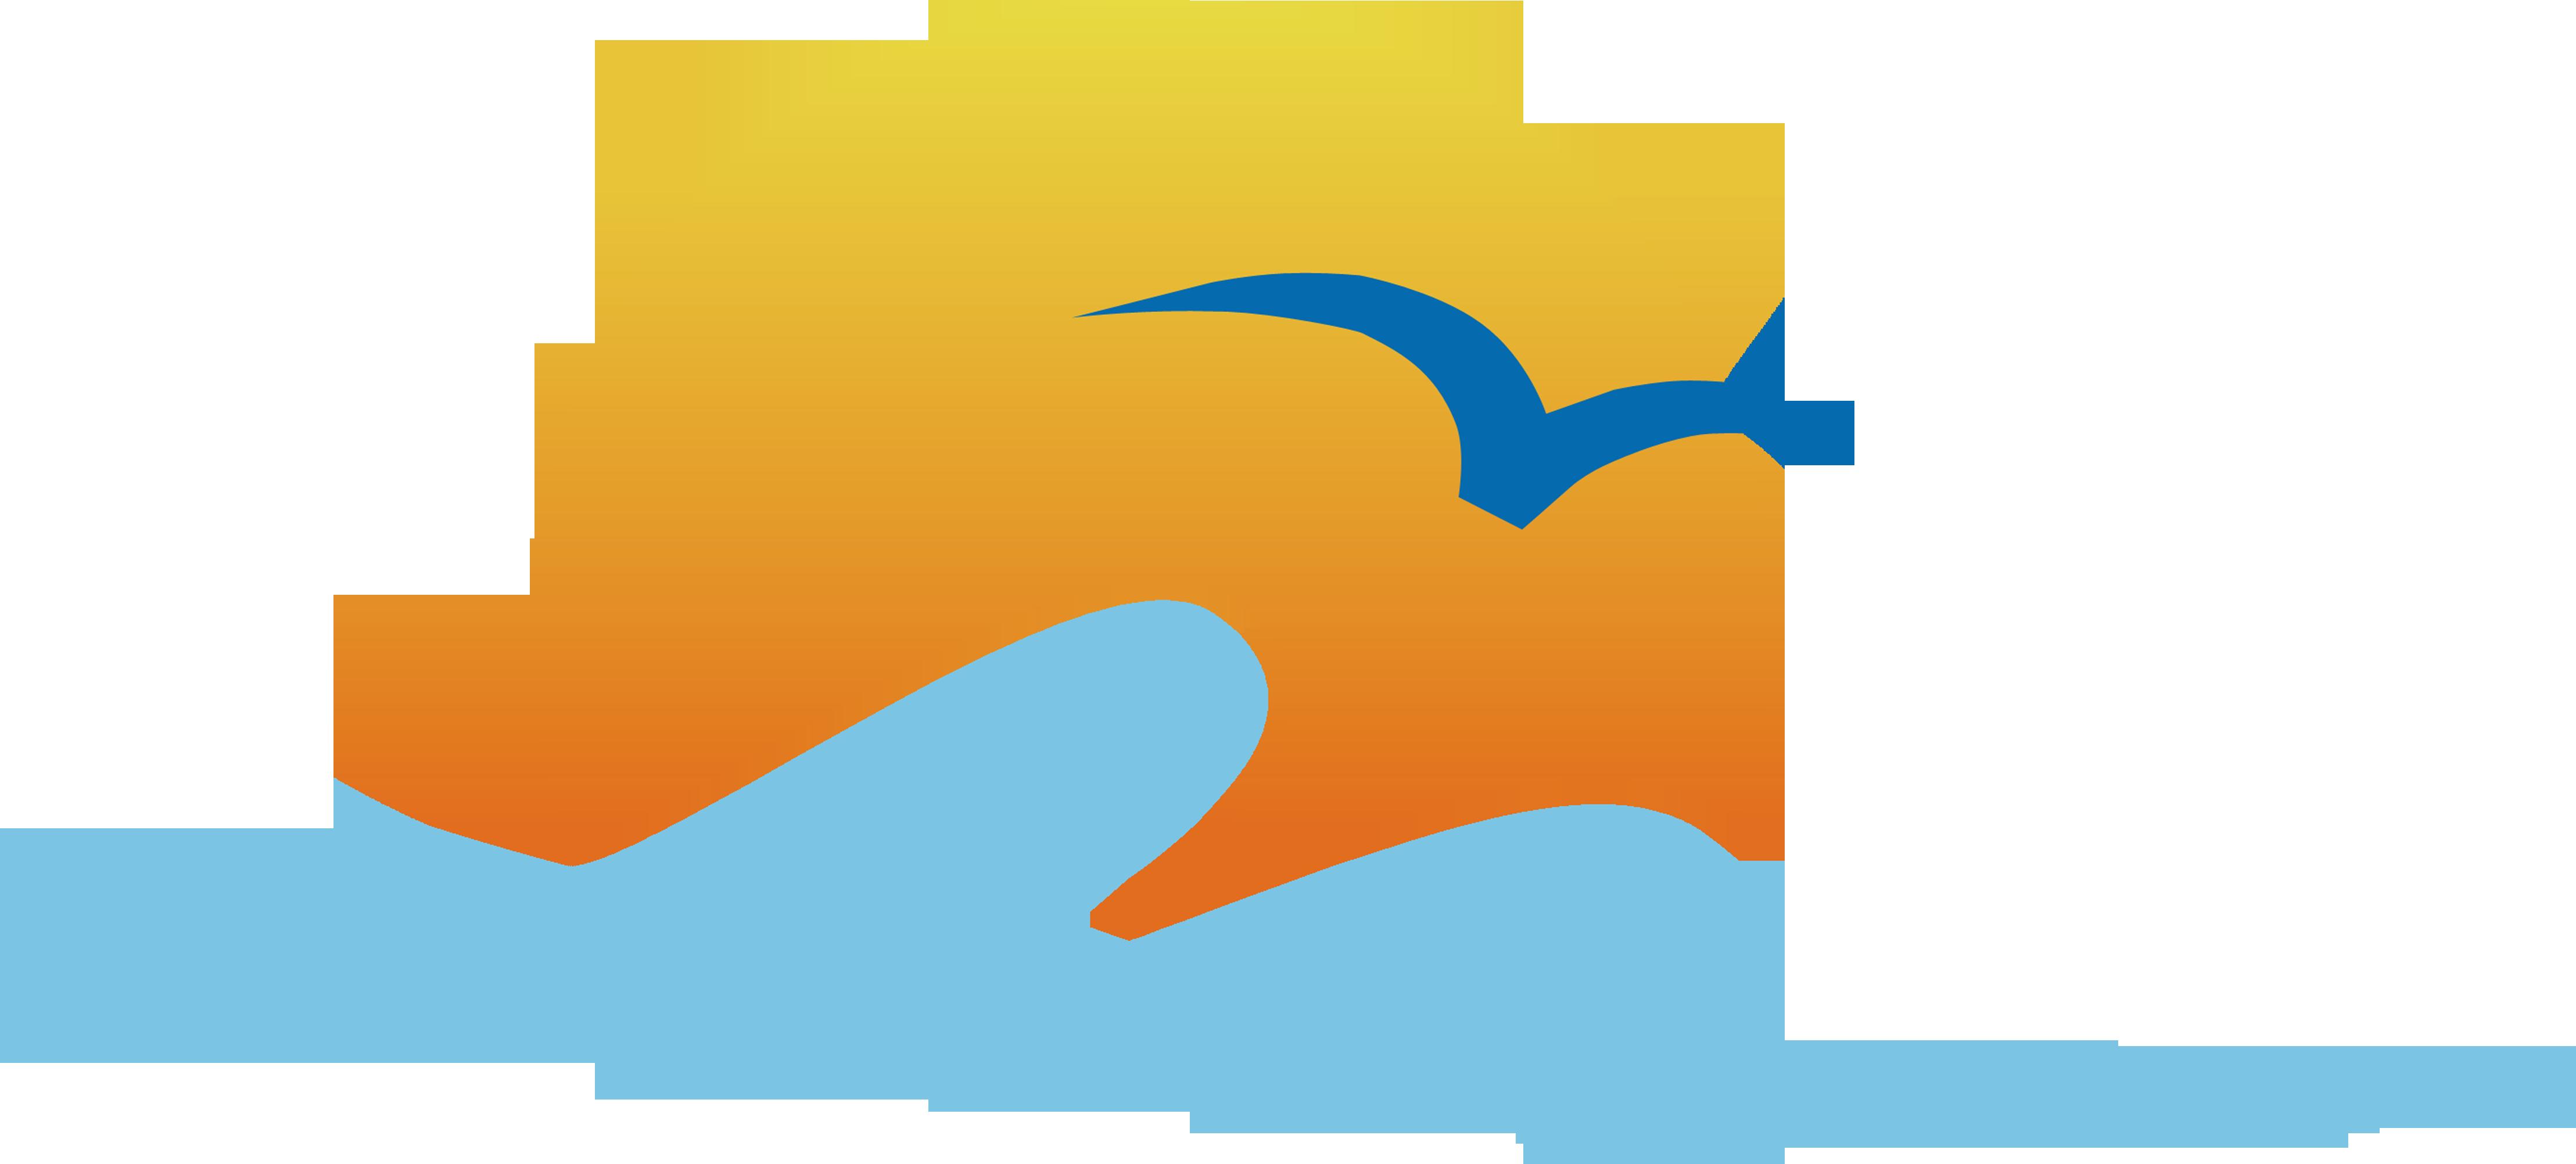 Giant logo c214cd76466fbbeae1ee29516d8b7c271c9c7b0c7faa757393473bb5237c49dd